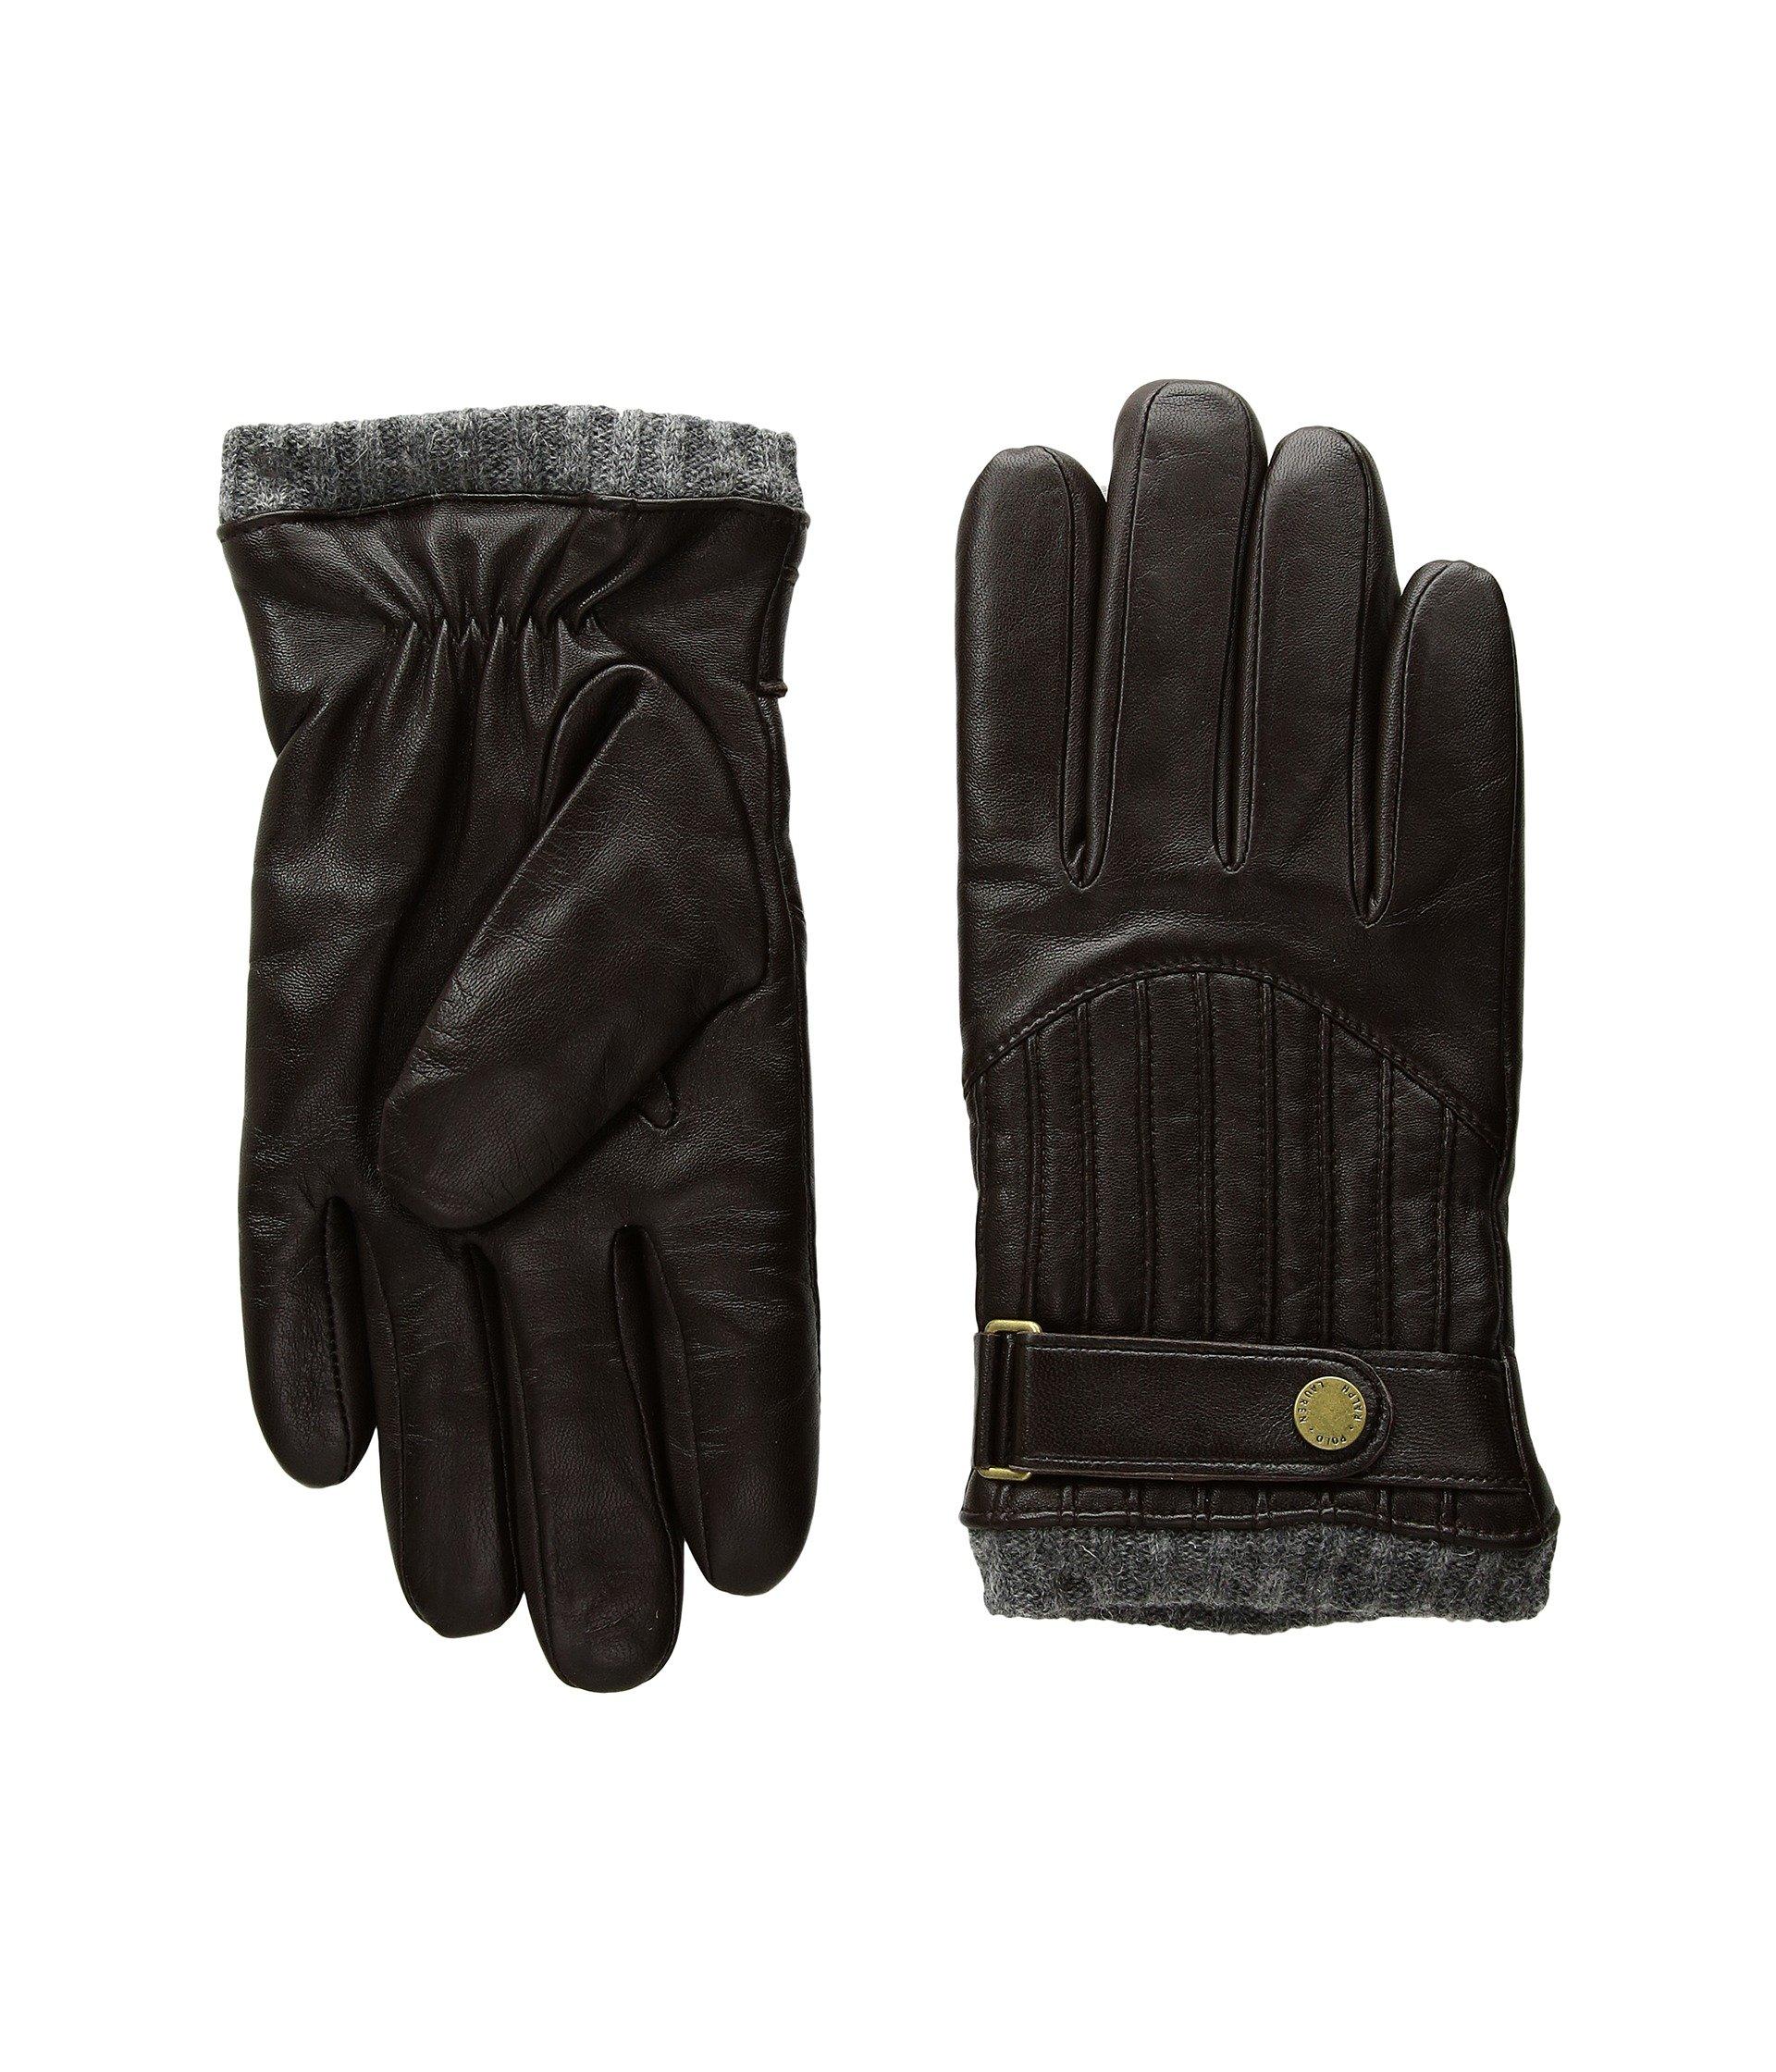 Guantes para Hombre Polo Ralph Lauren Quilted Racing Gloves  + Polo Ralph Lauren en VeoyCompro.net